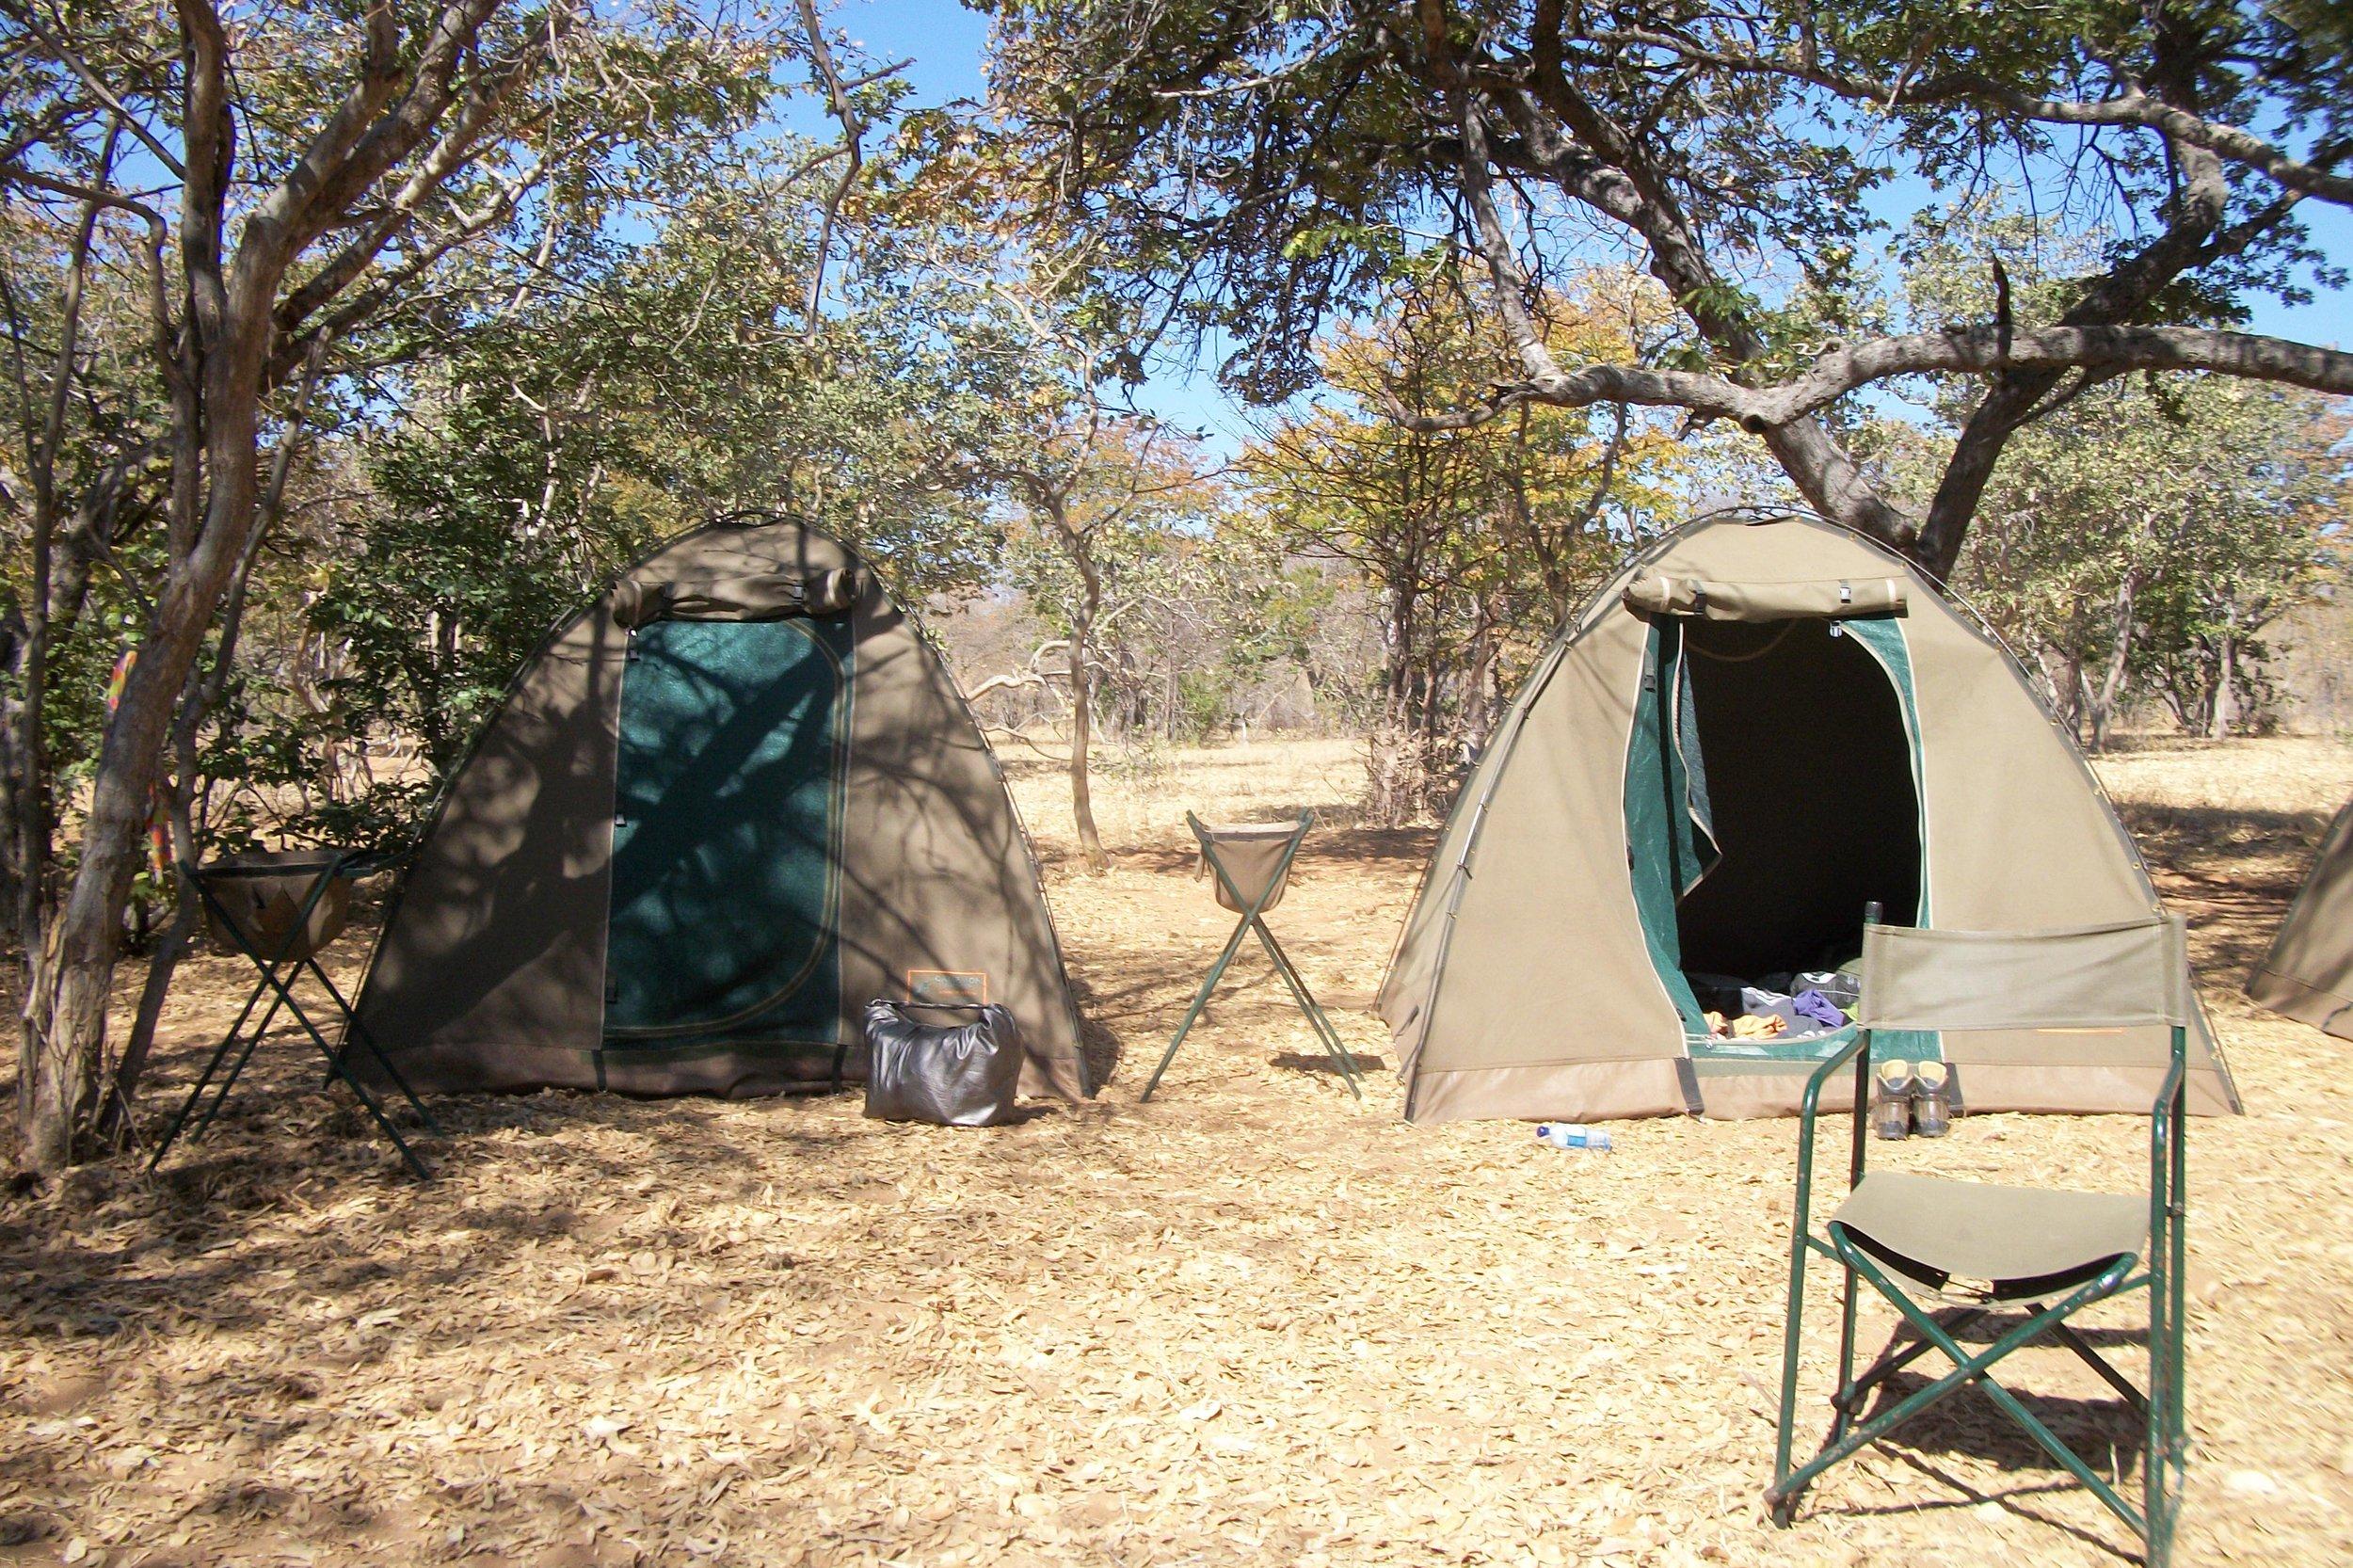 safari campsite safari chobe national park botswana.JPG